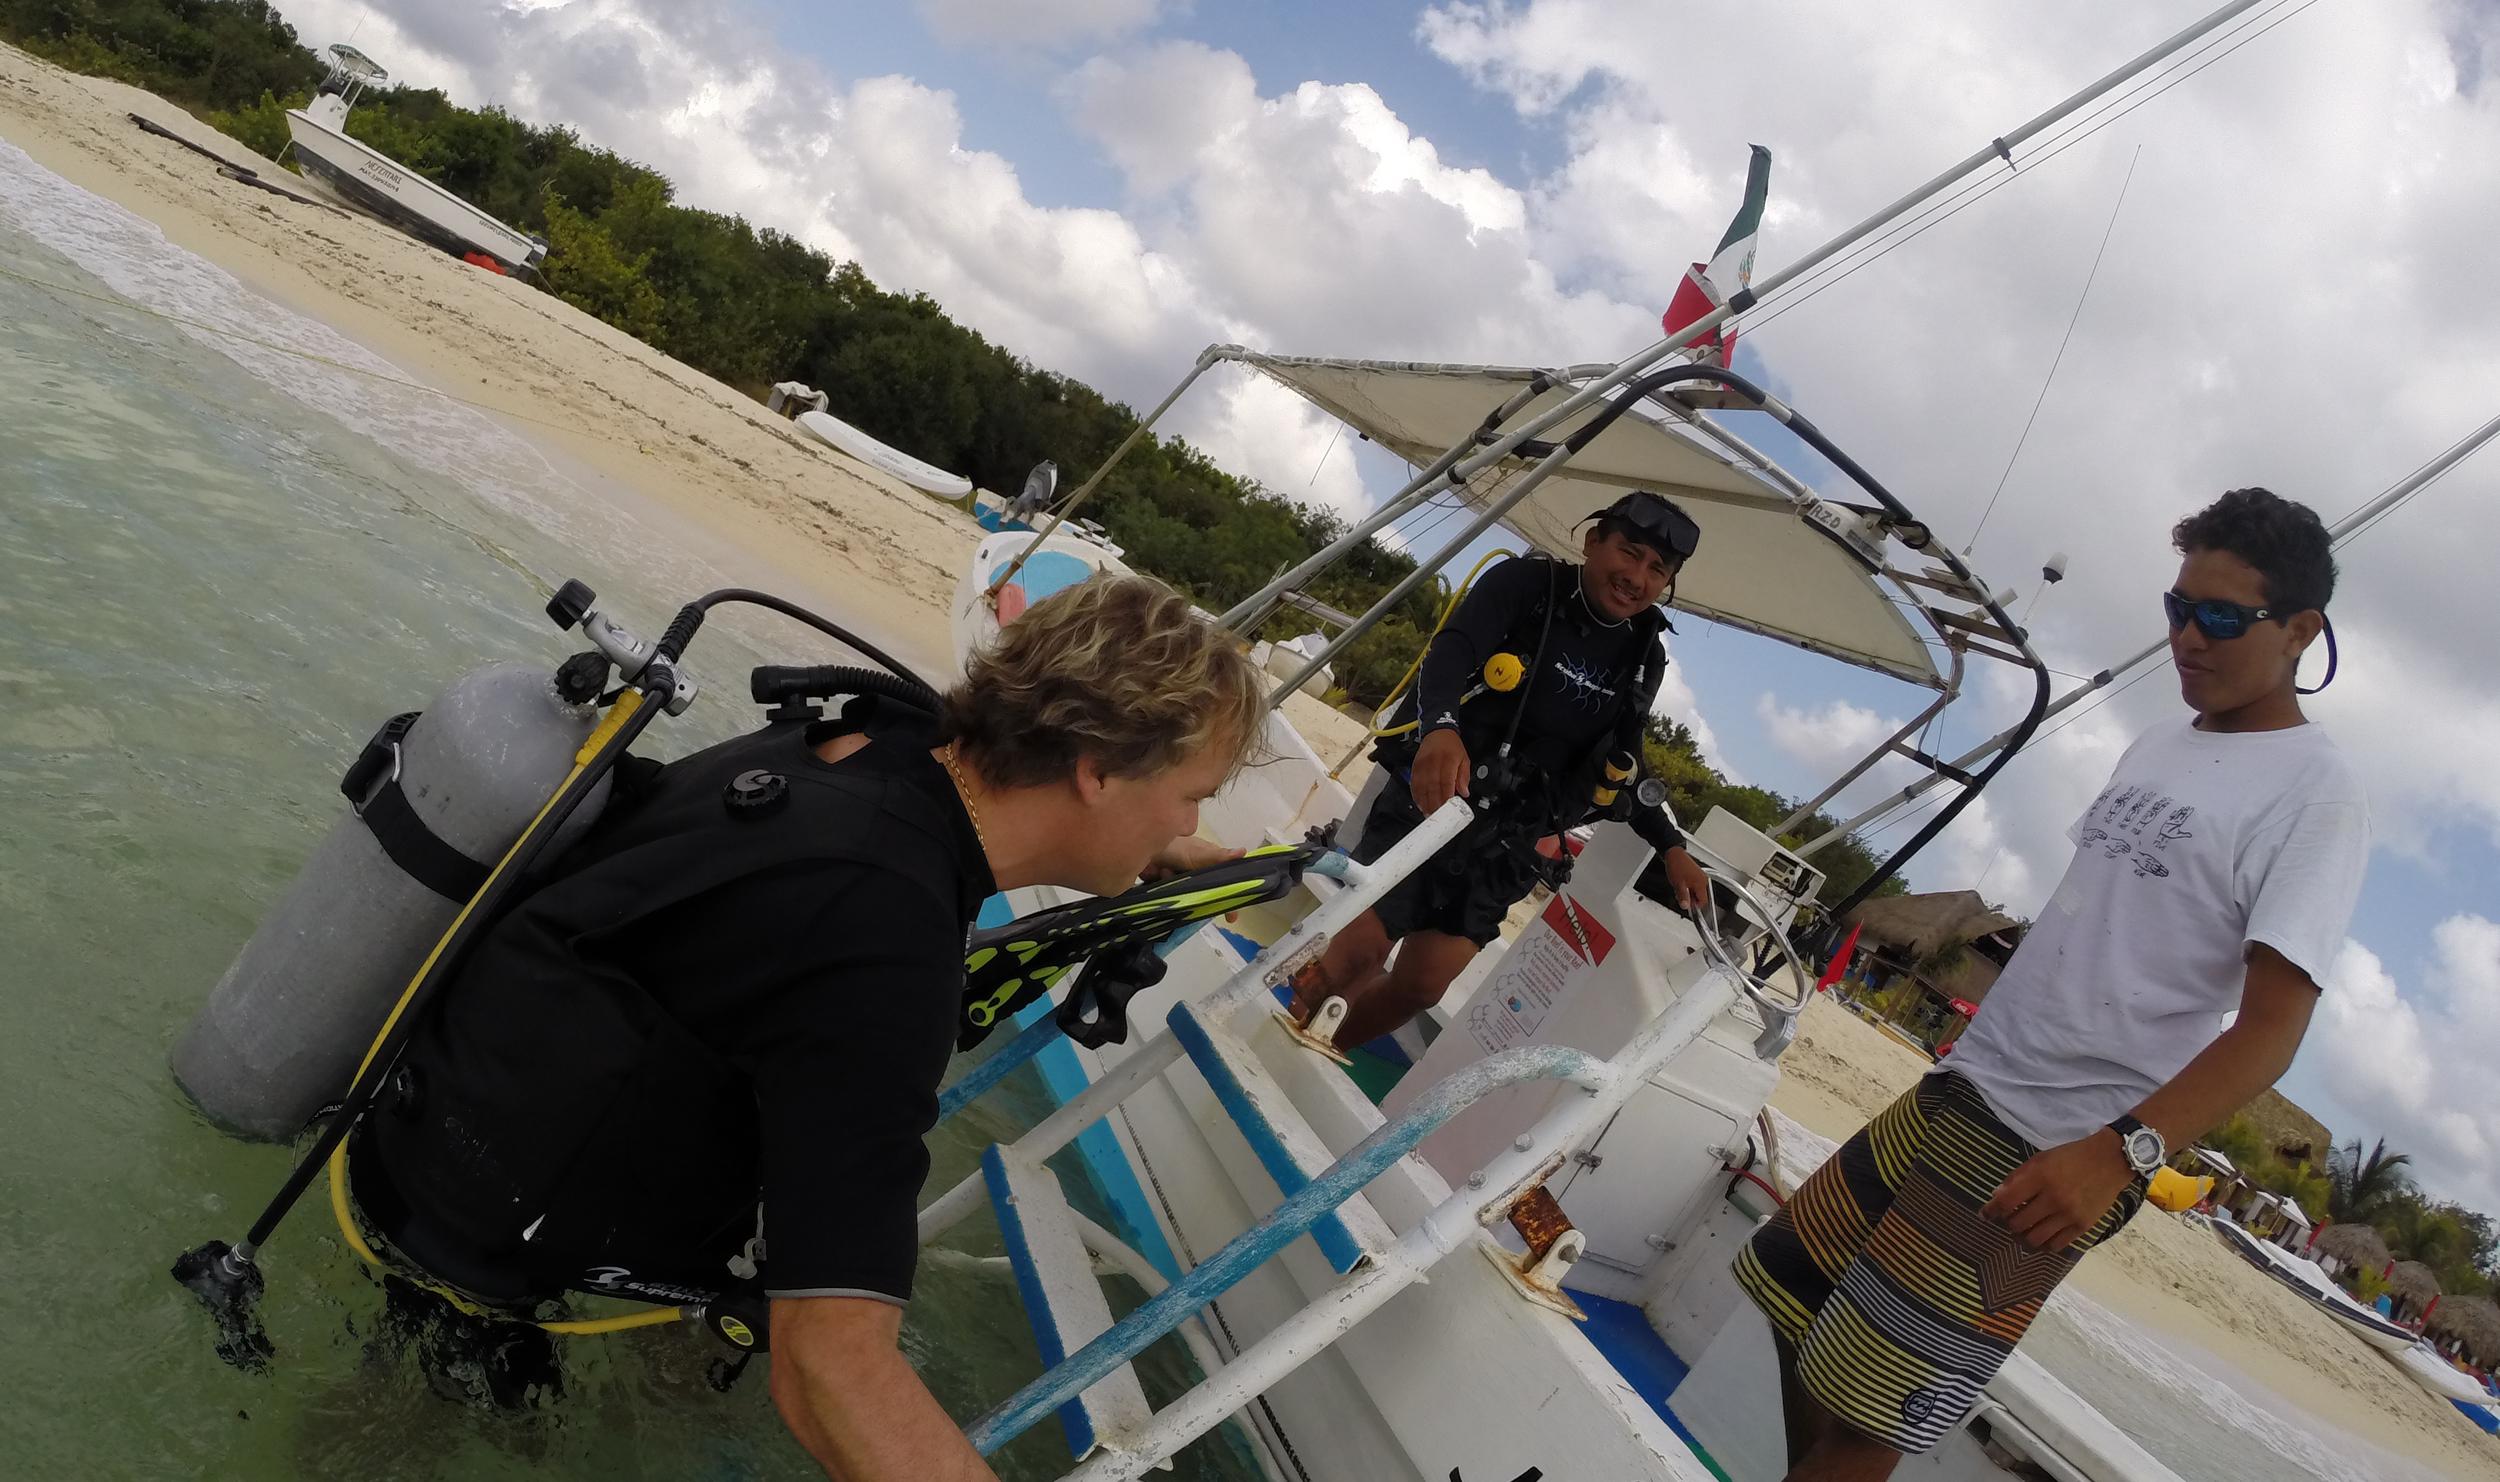 Boarding the boat